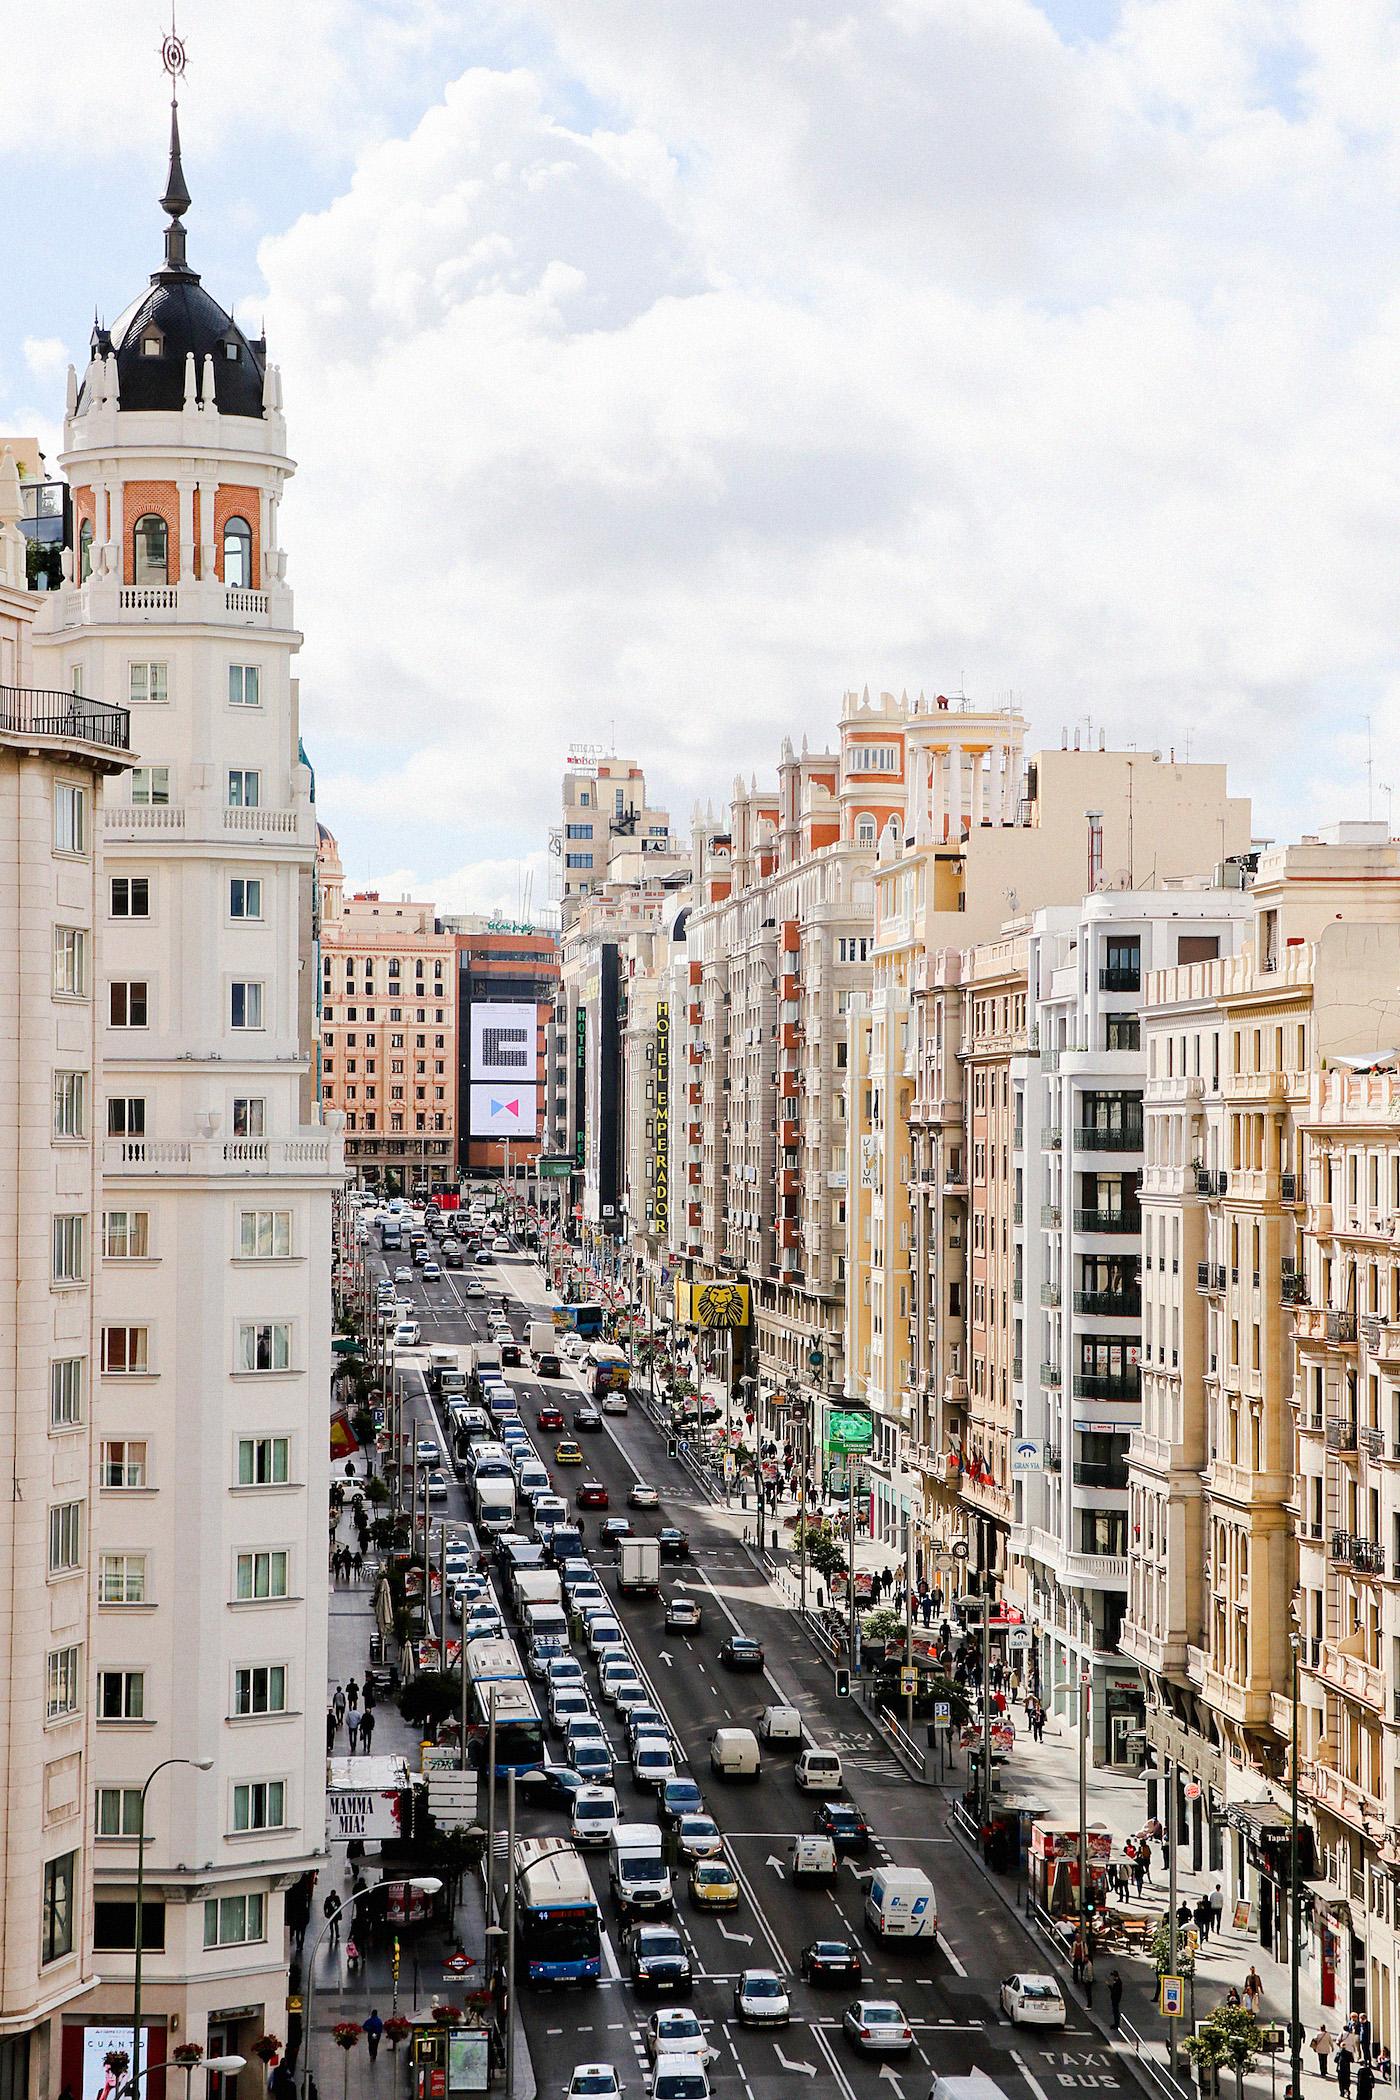 www.thegoldenbun.com |madrid barcelo torre de madrid, madrid sightseeing, four days in madrid